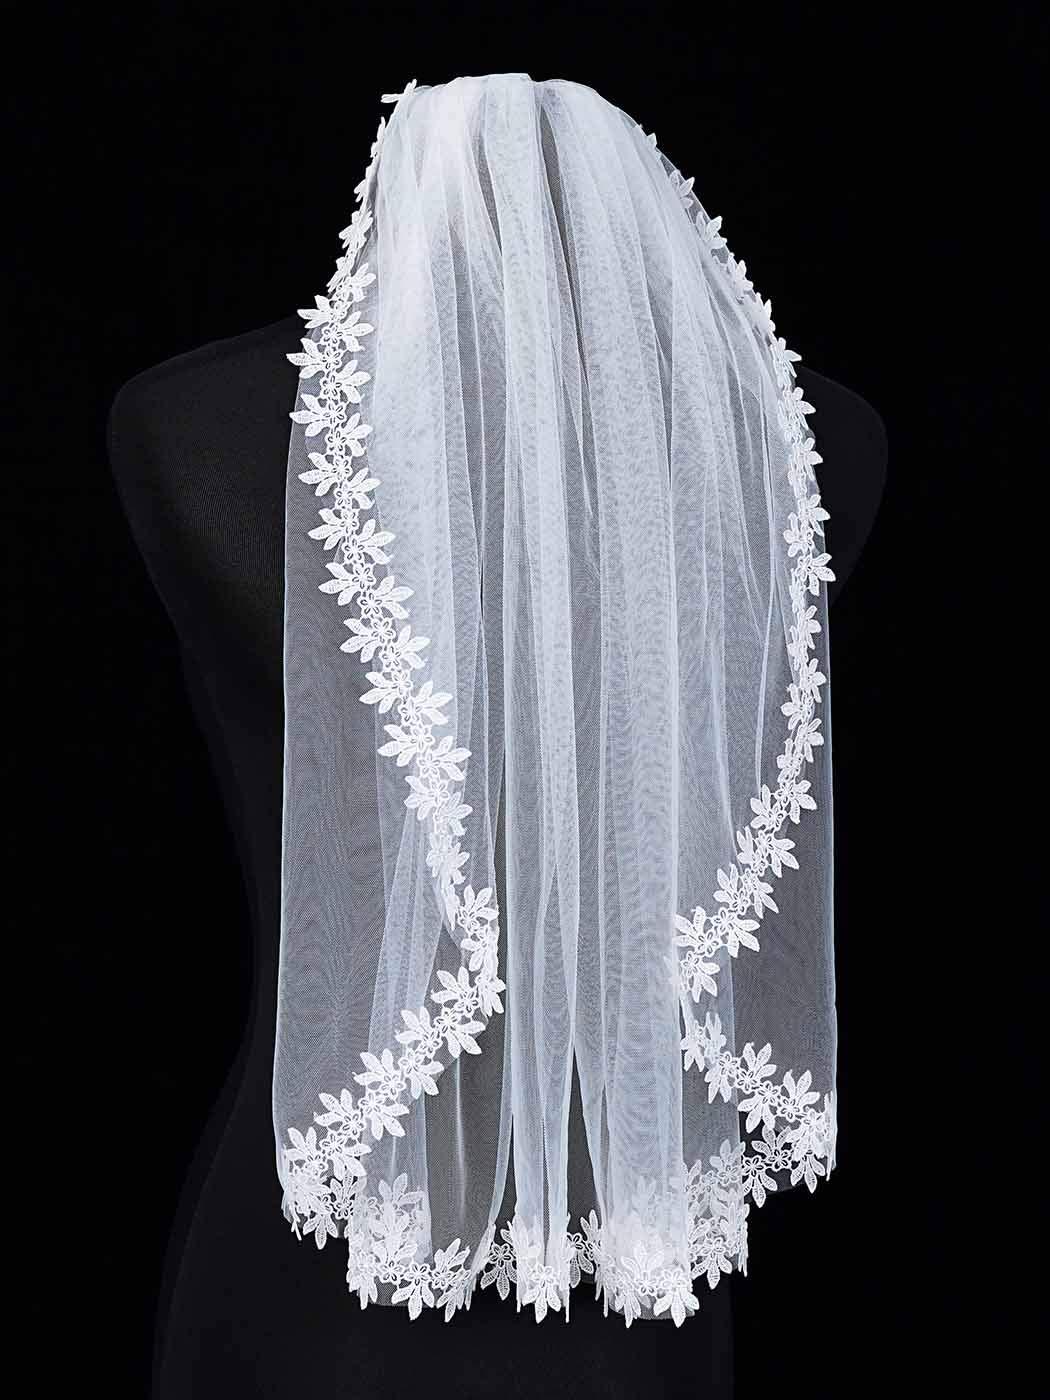 Yokawe Women's Bridal Wedding Veil 1 Tier Lace Applique Edge Bride Veils with Comb White Wedding Headpiece (White)